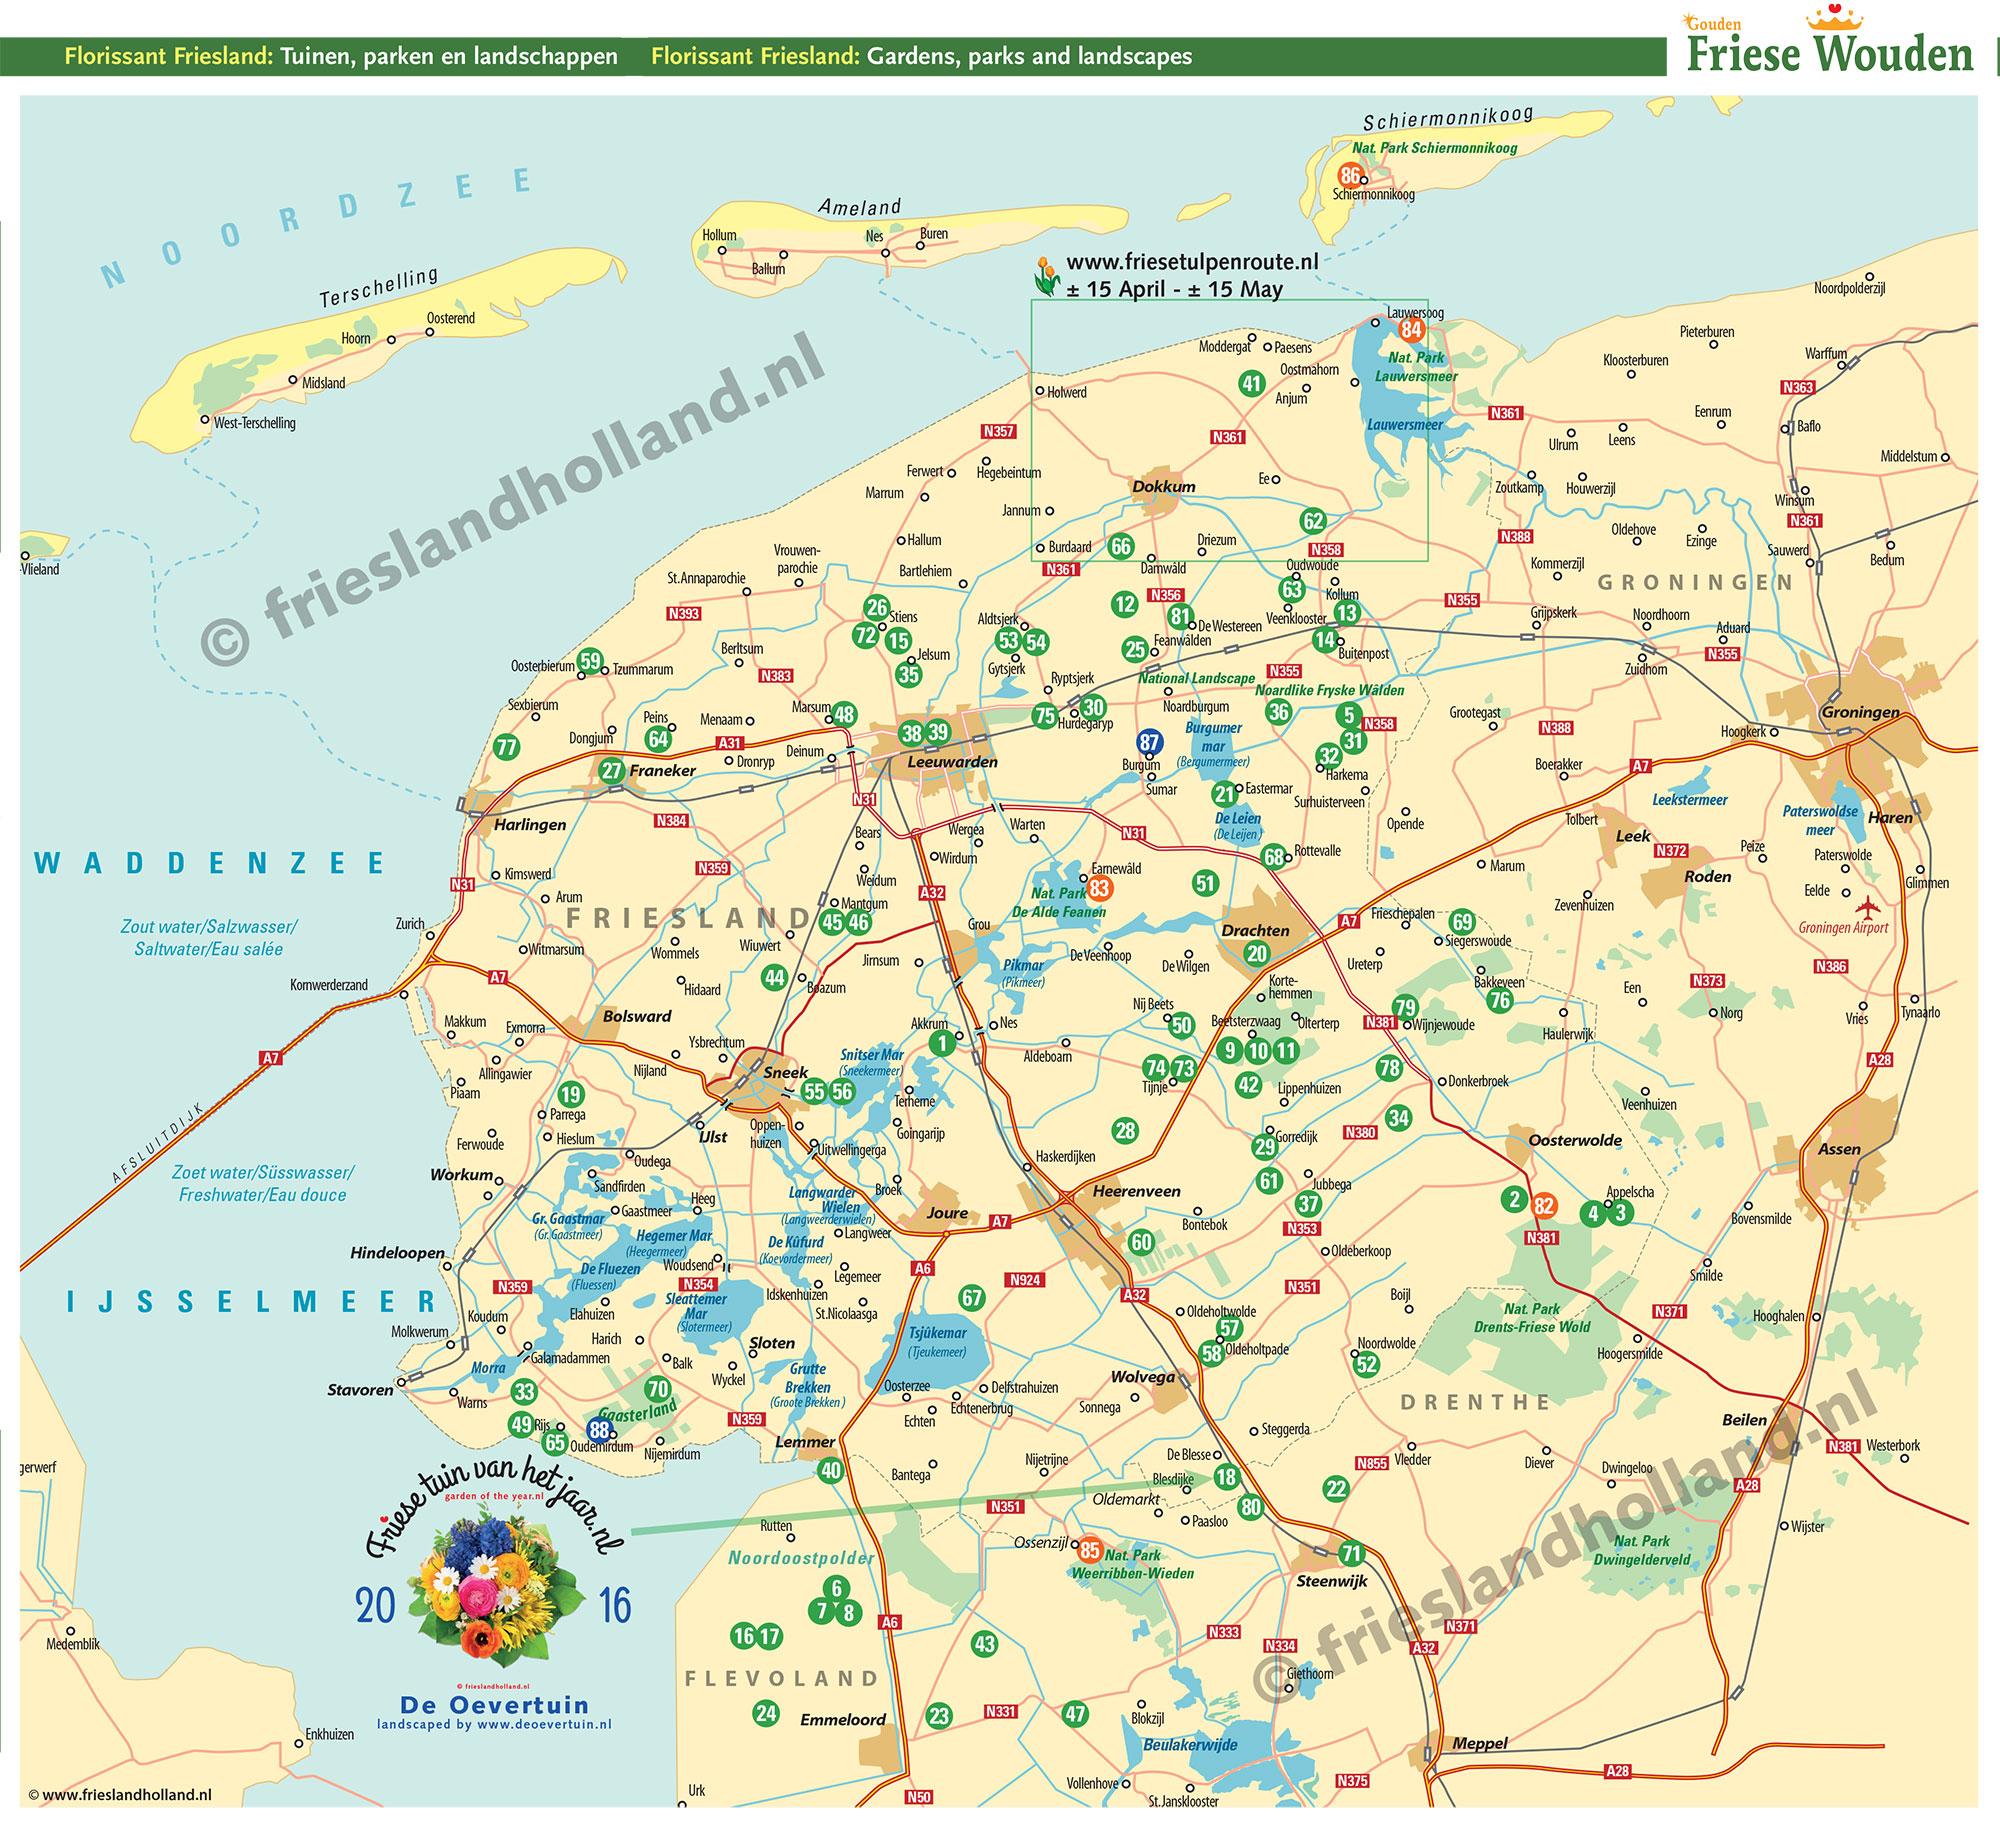 Tuinenroute kaart